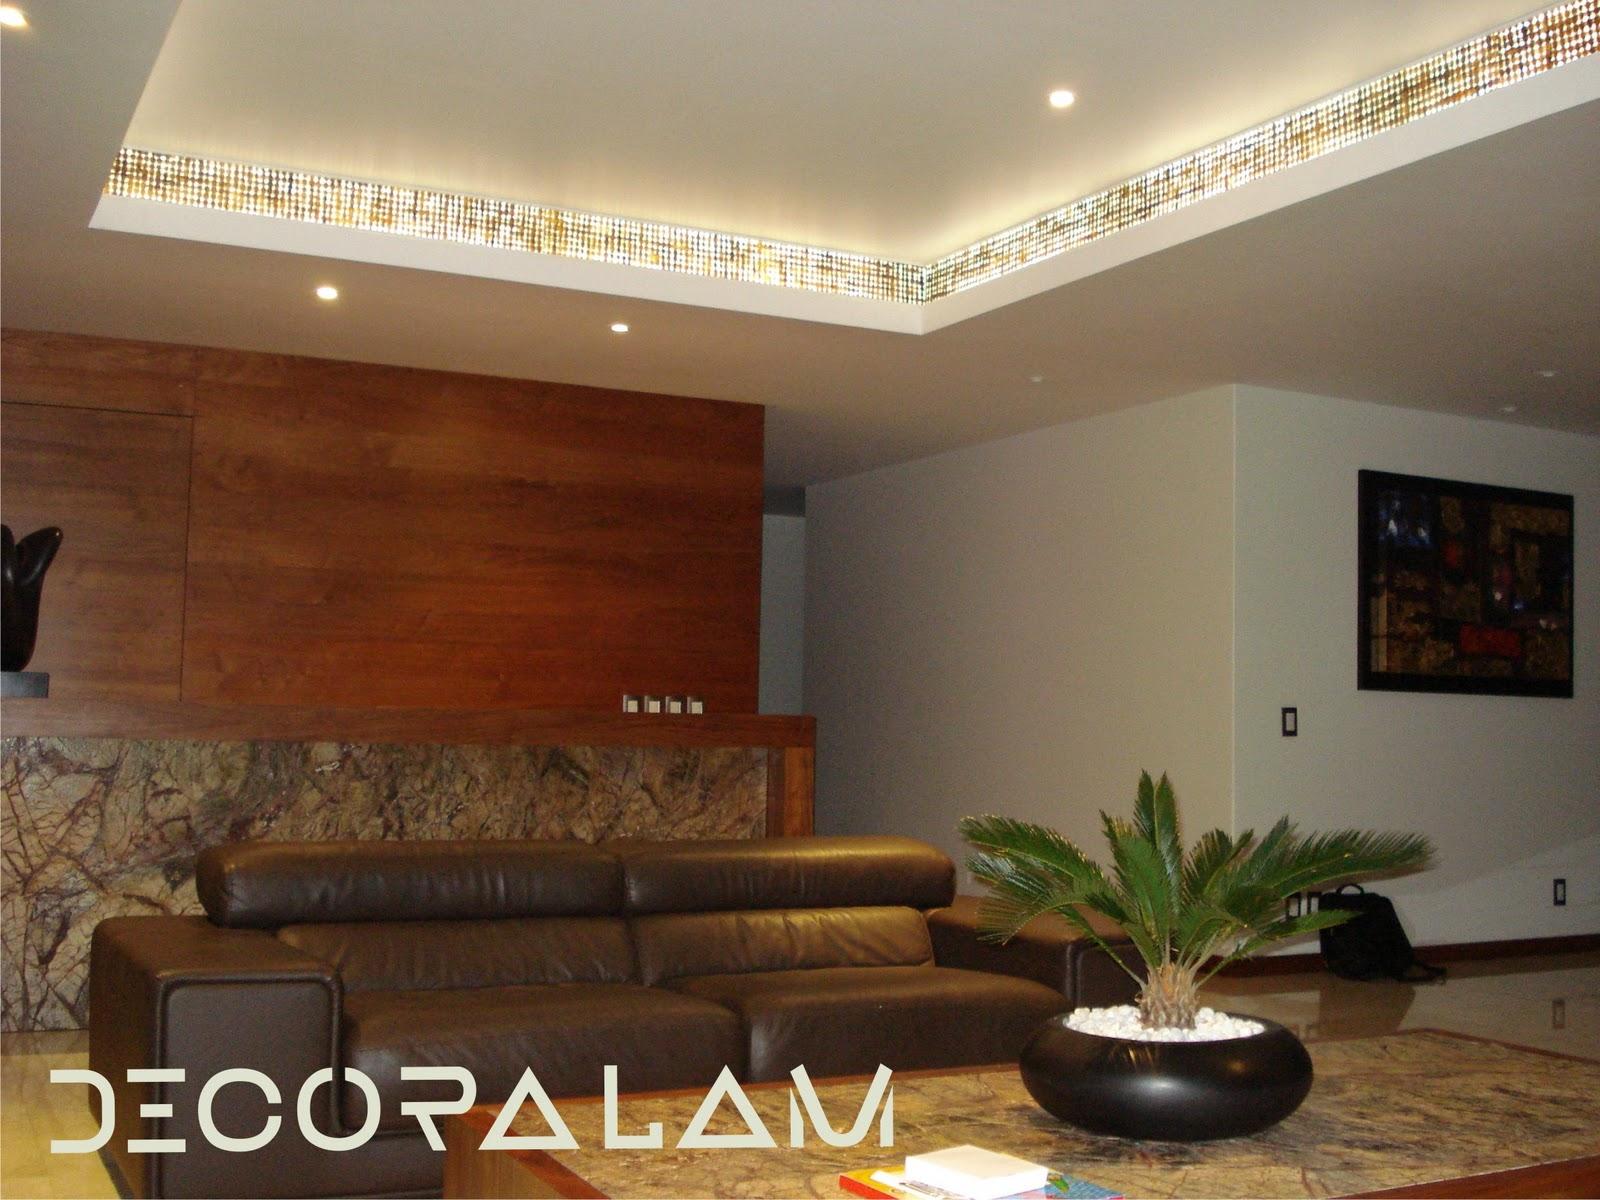 Pin plafones en salas wallpapers real madrid on pinterest for Plafones decorativos pared